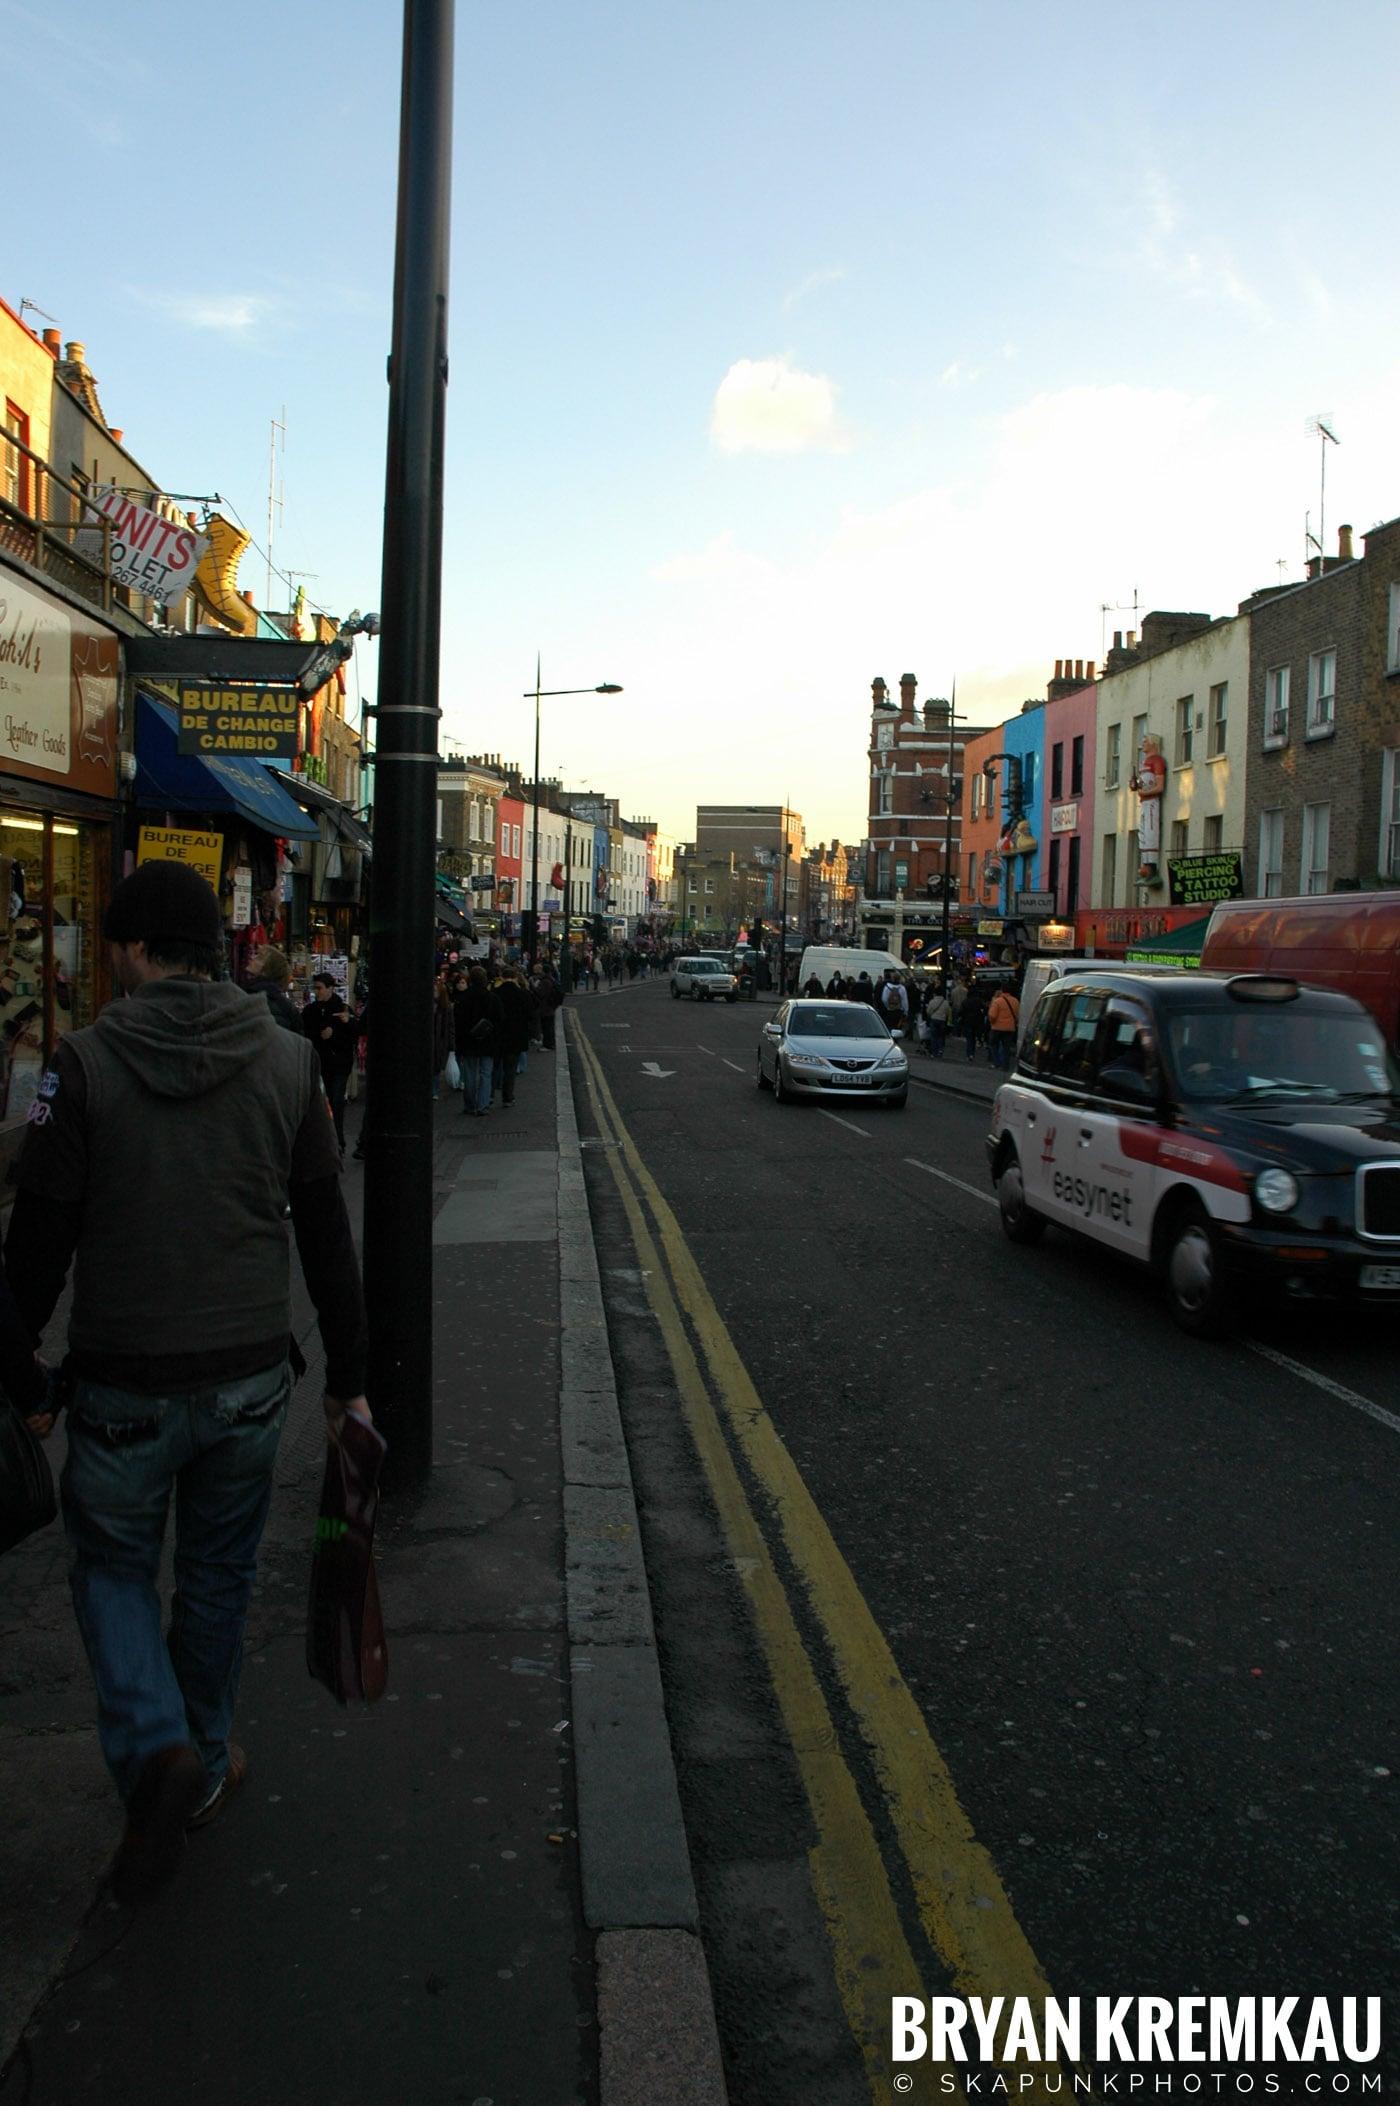 London, England - Day 4 - 12.19.05 (10)